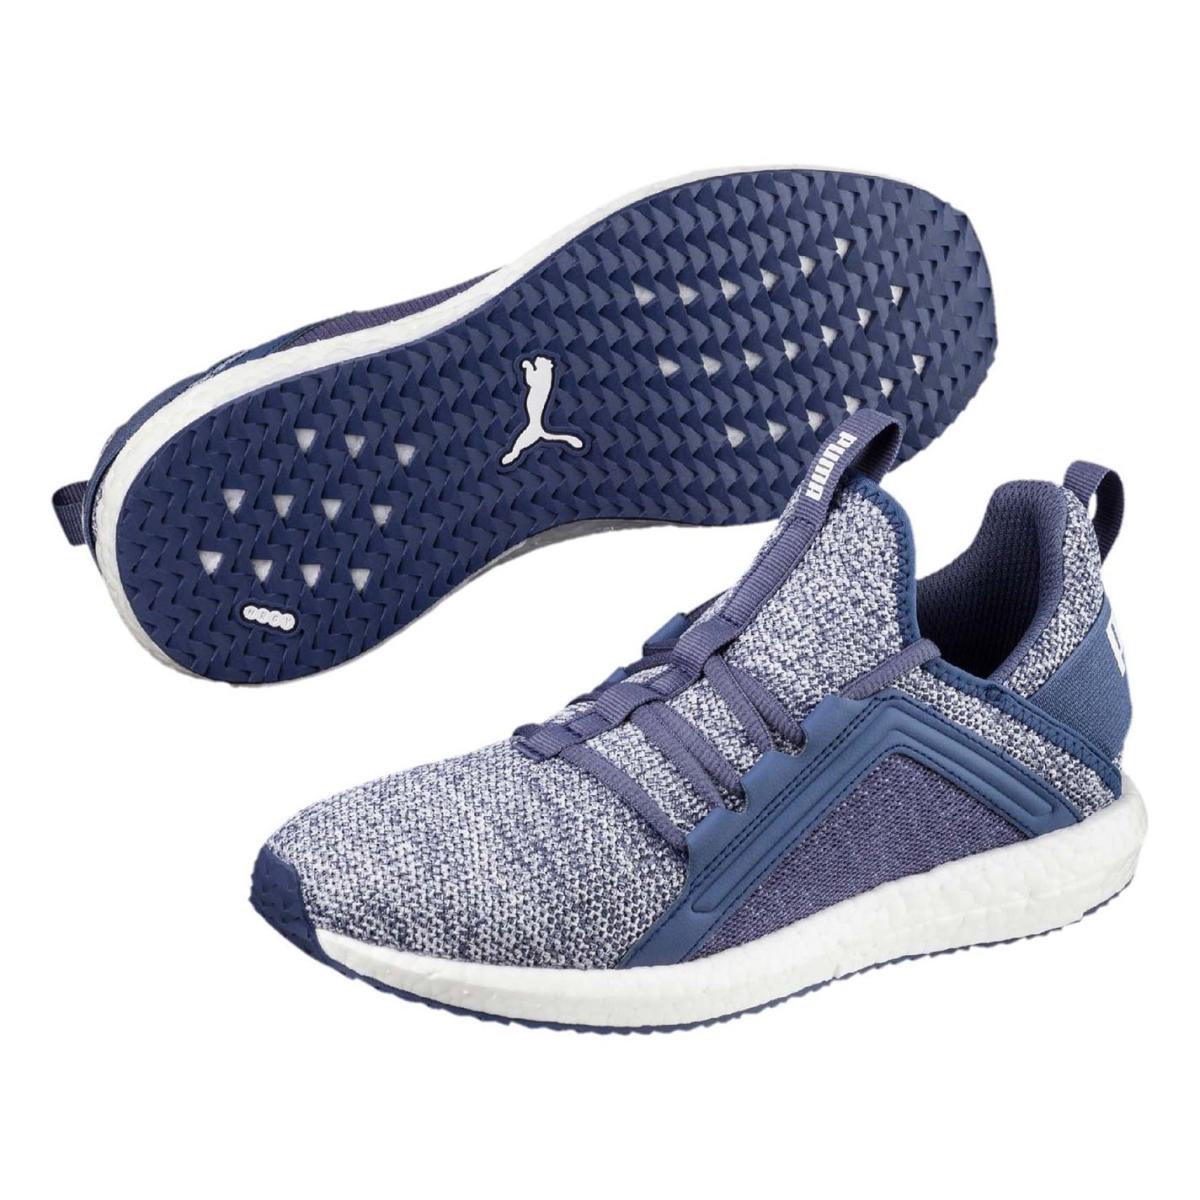 Puma Mega NRGY Knit Turnschuhe Sportschuhe Blau